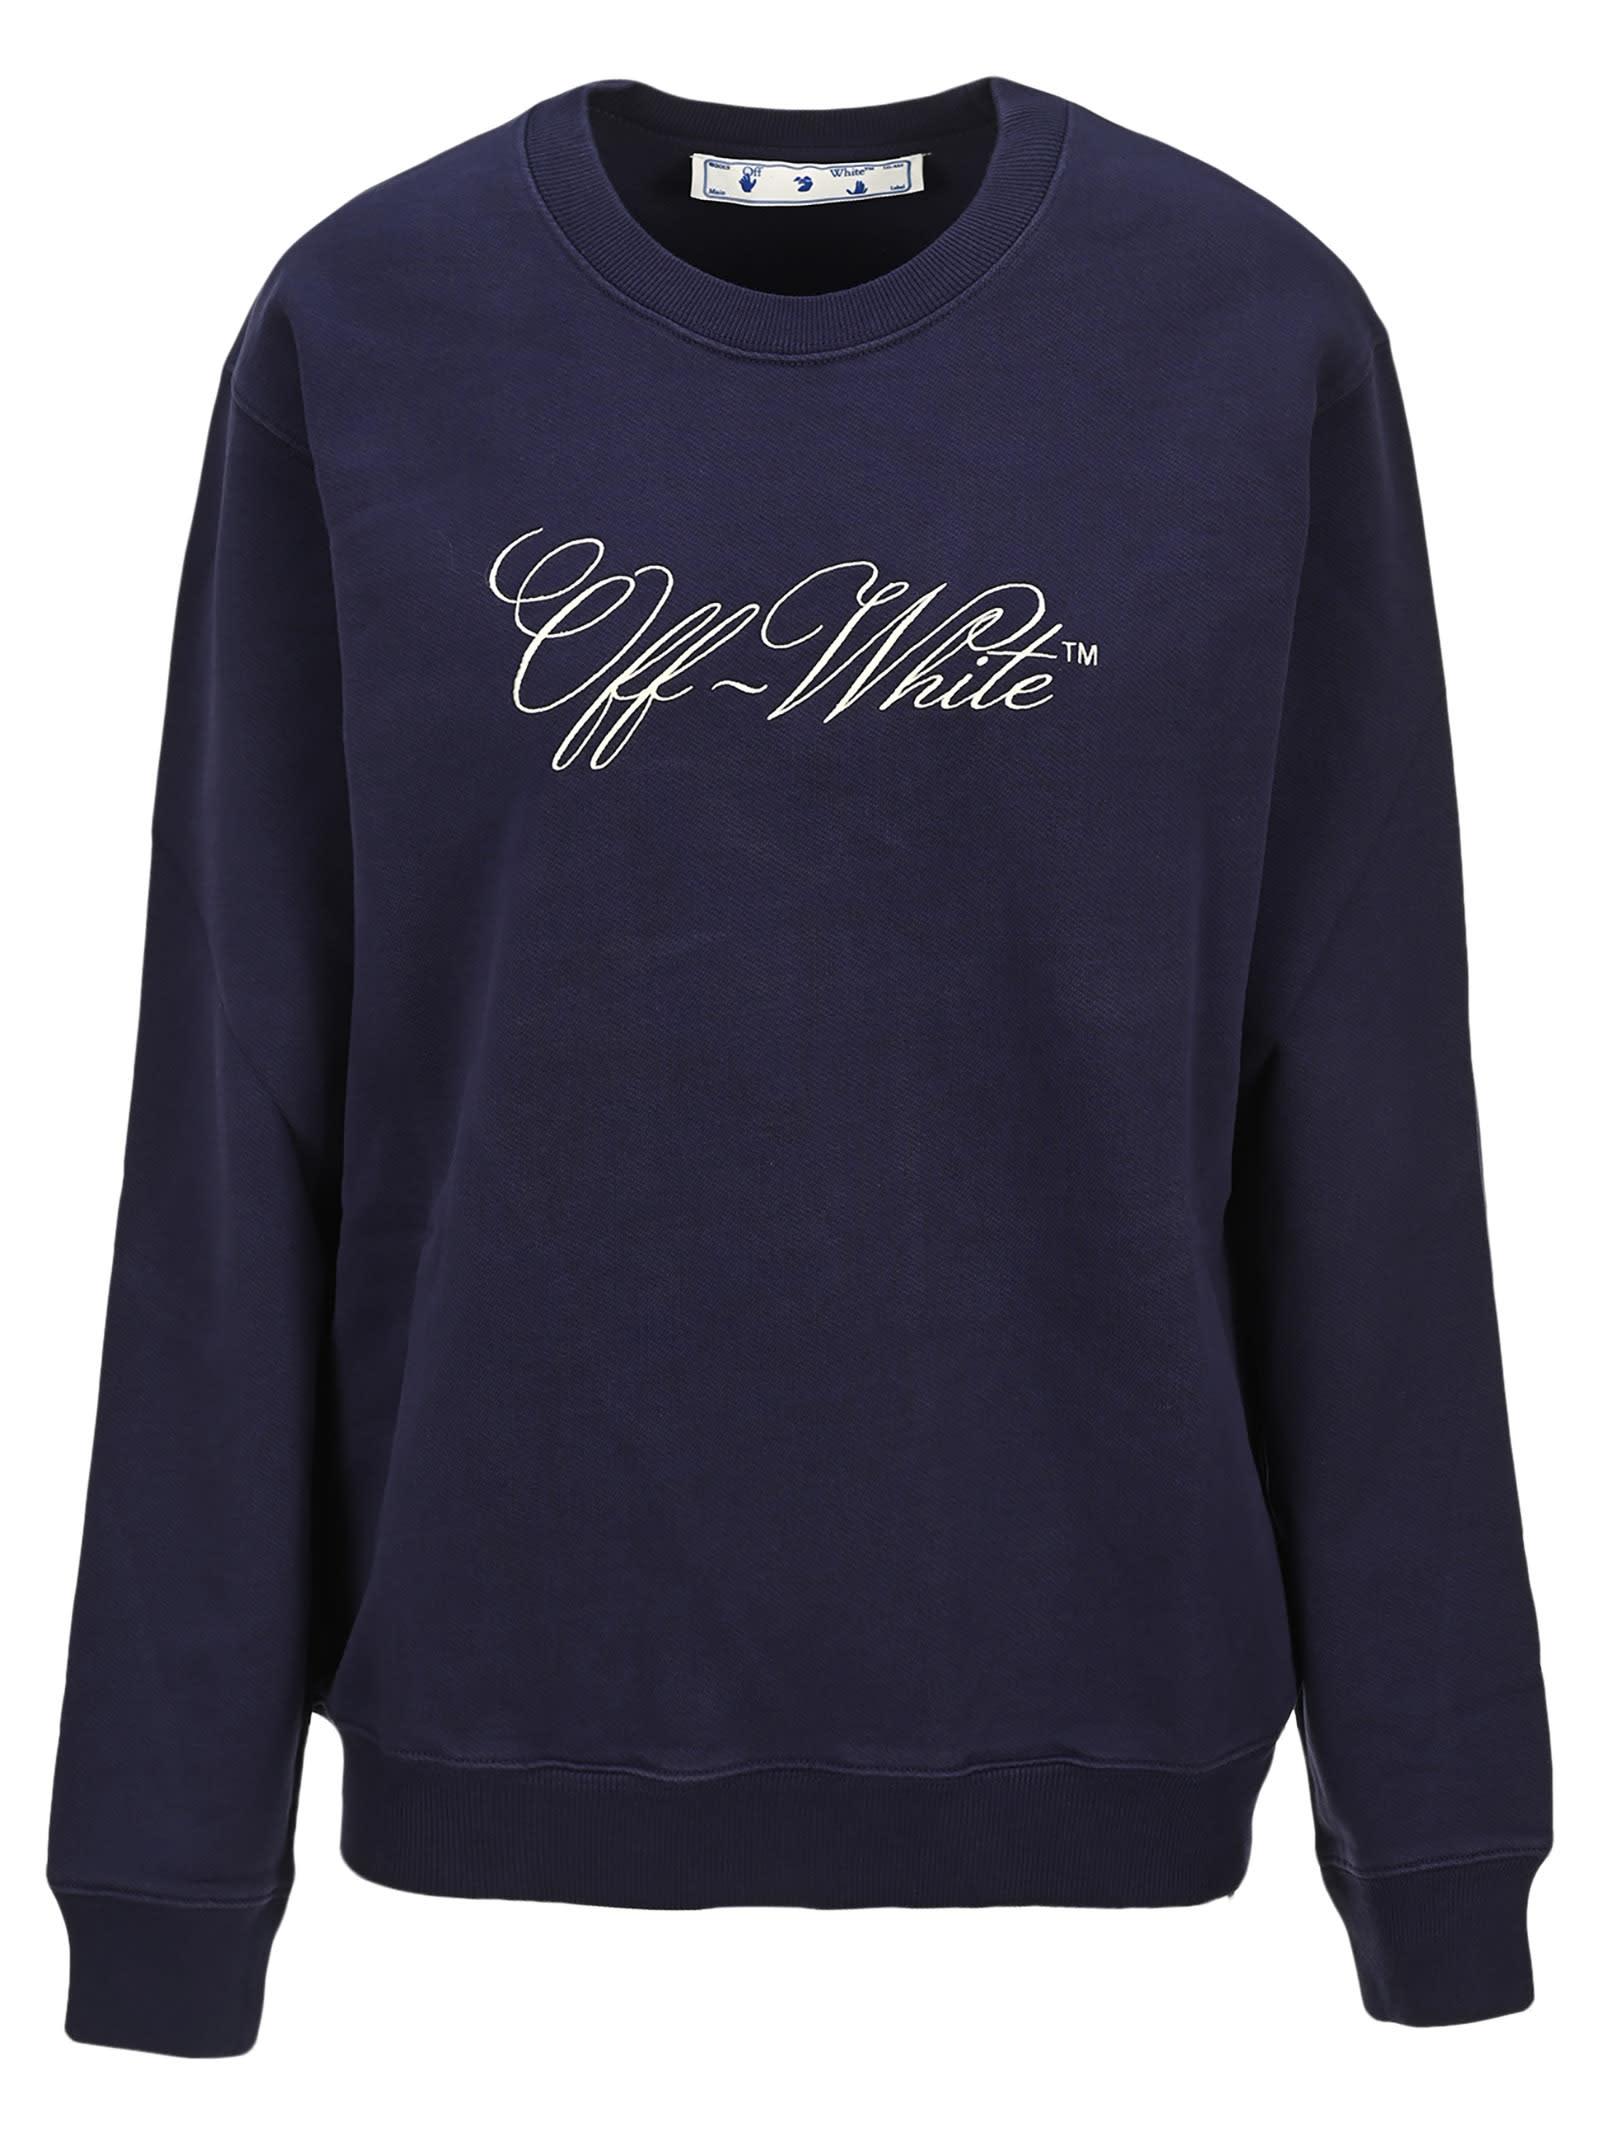 Off White Embroidered Logo Sweatshirt